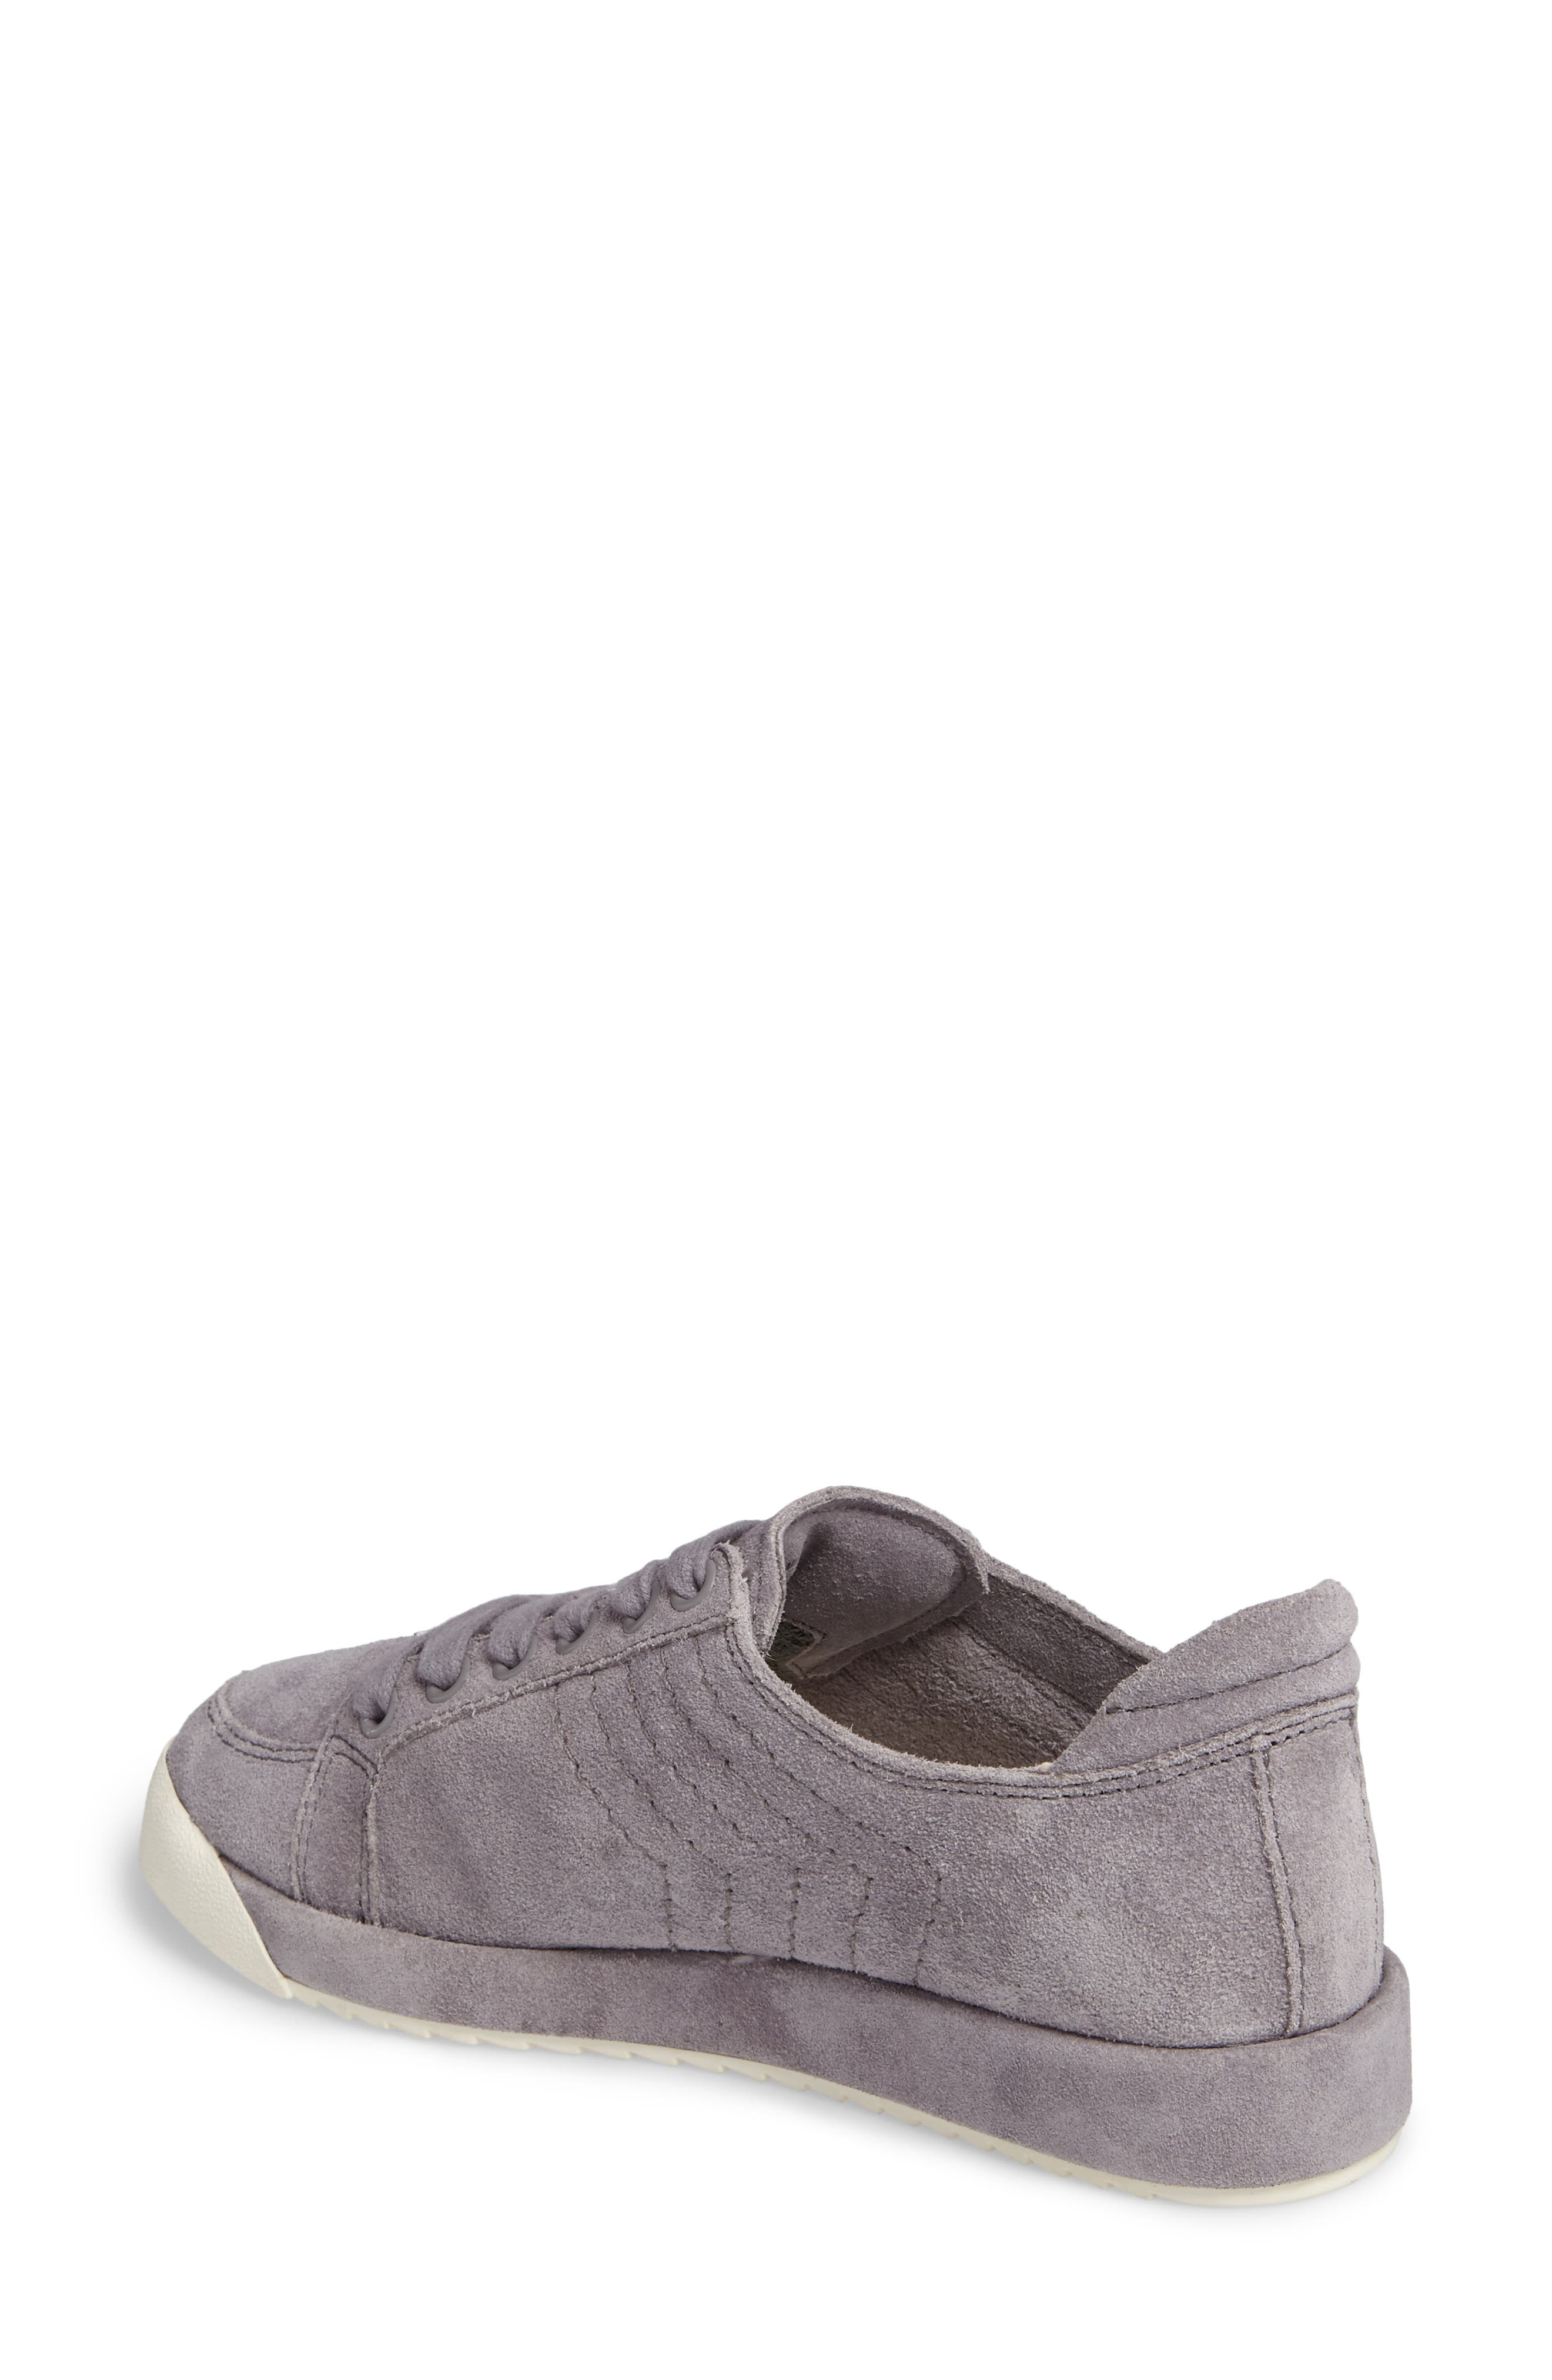 Sage Low-Top Sneaker,                             Alternate thumbnail 2, color,                             020